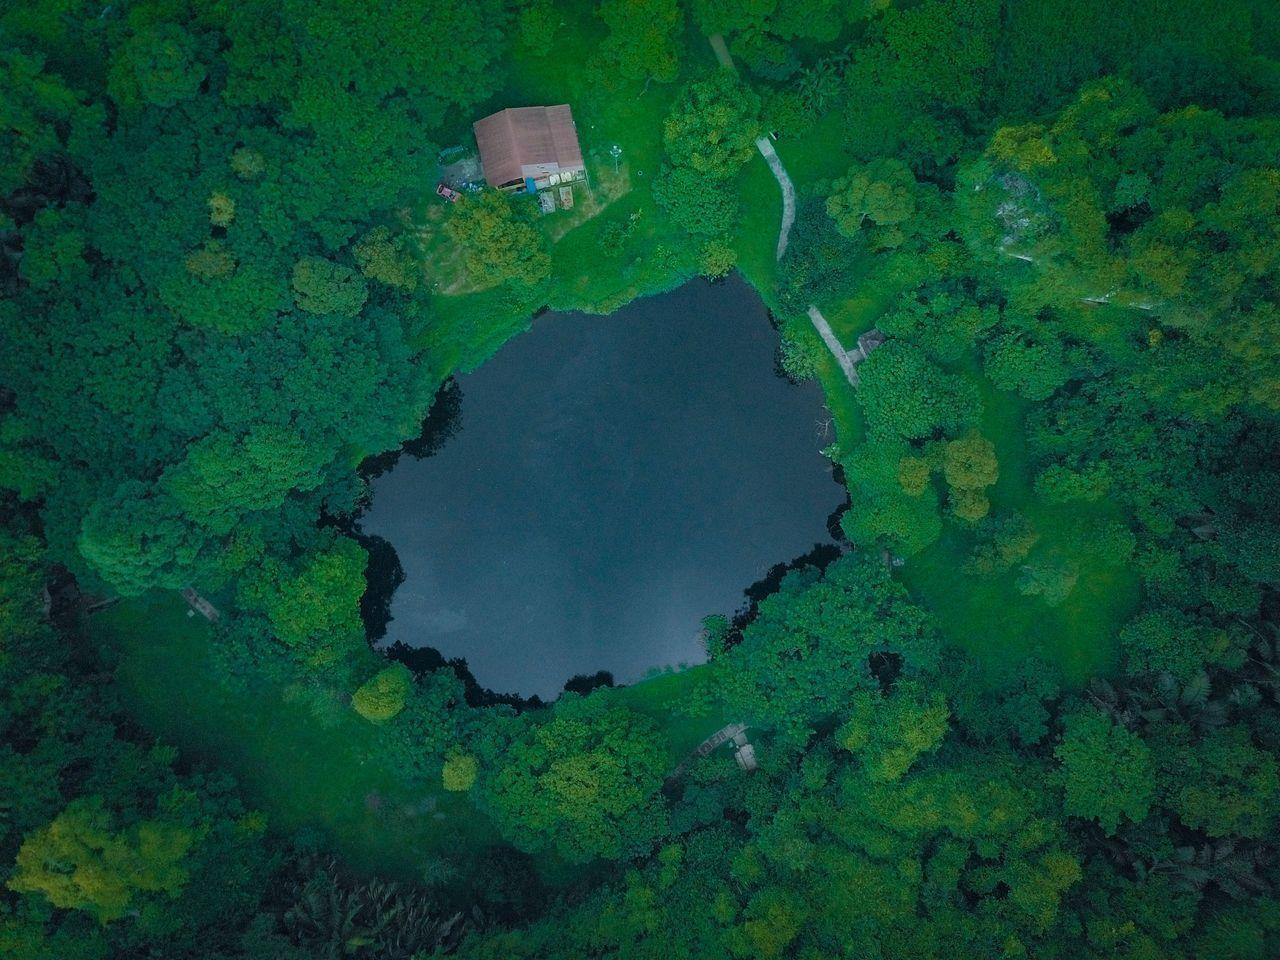 FULL FRAME SHOT OF LAKE WITH GREEN LEAF